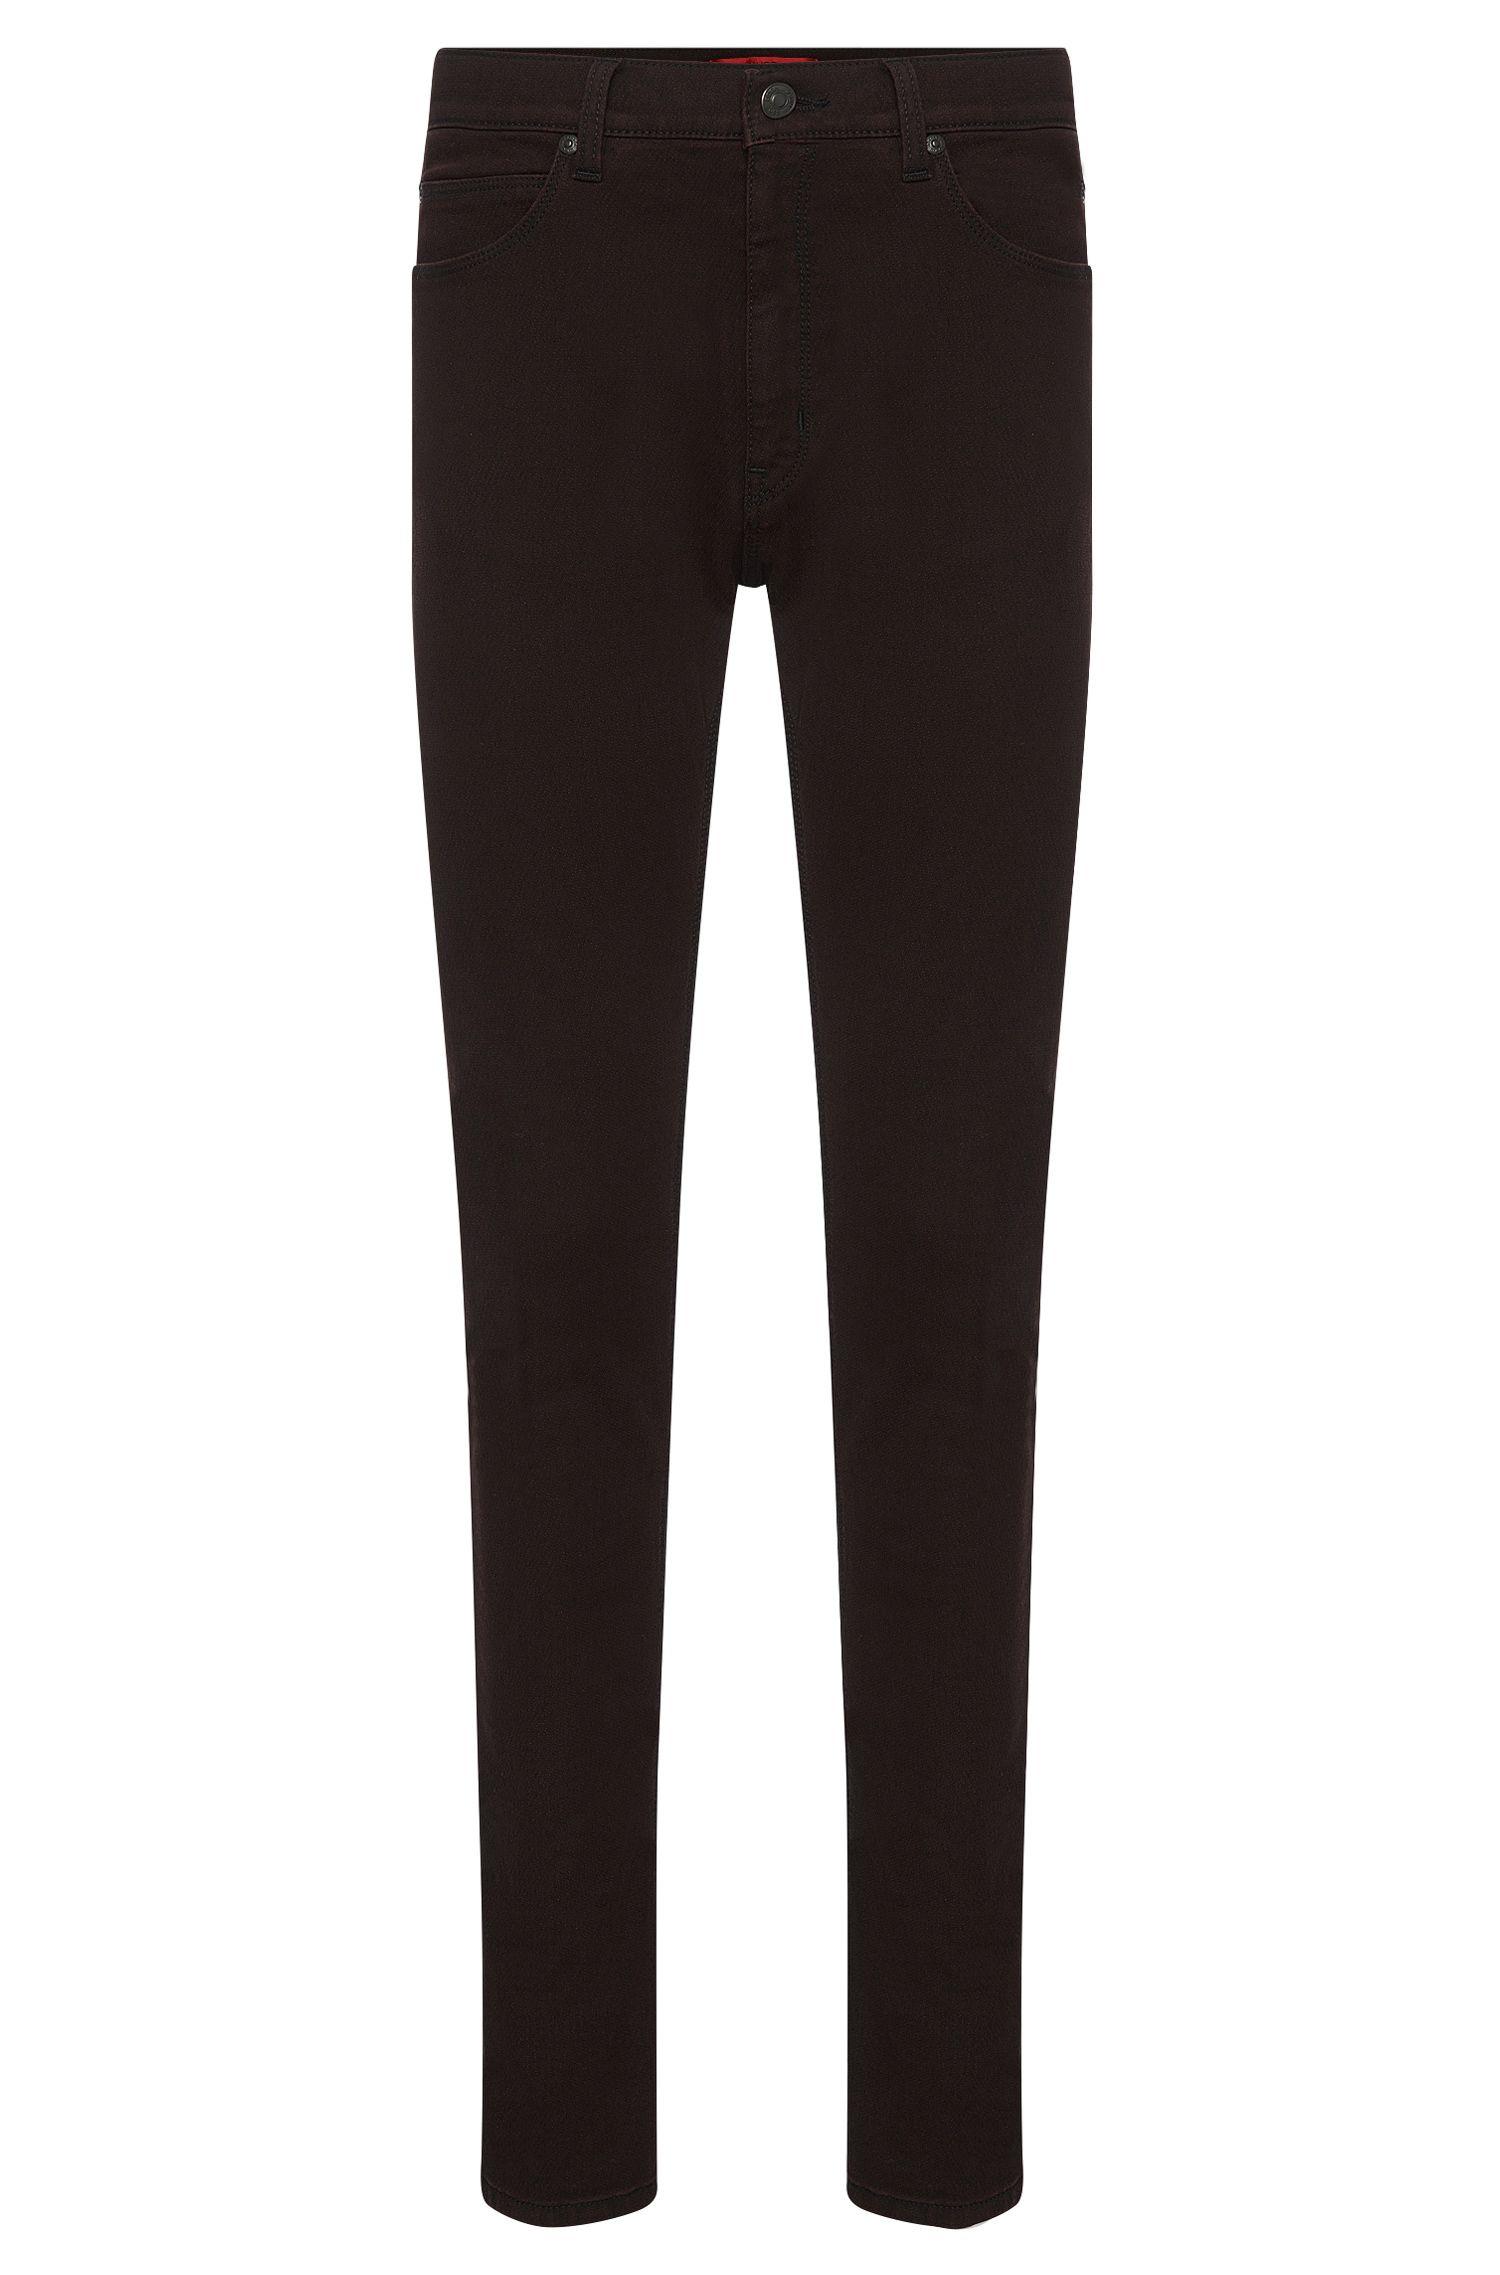 'HUGO 734' | Skinny Fit, 10 oz Stretch Cotton Blend Jeans